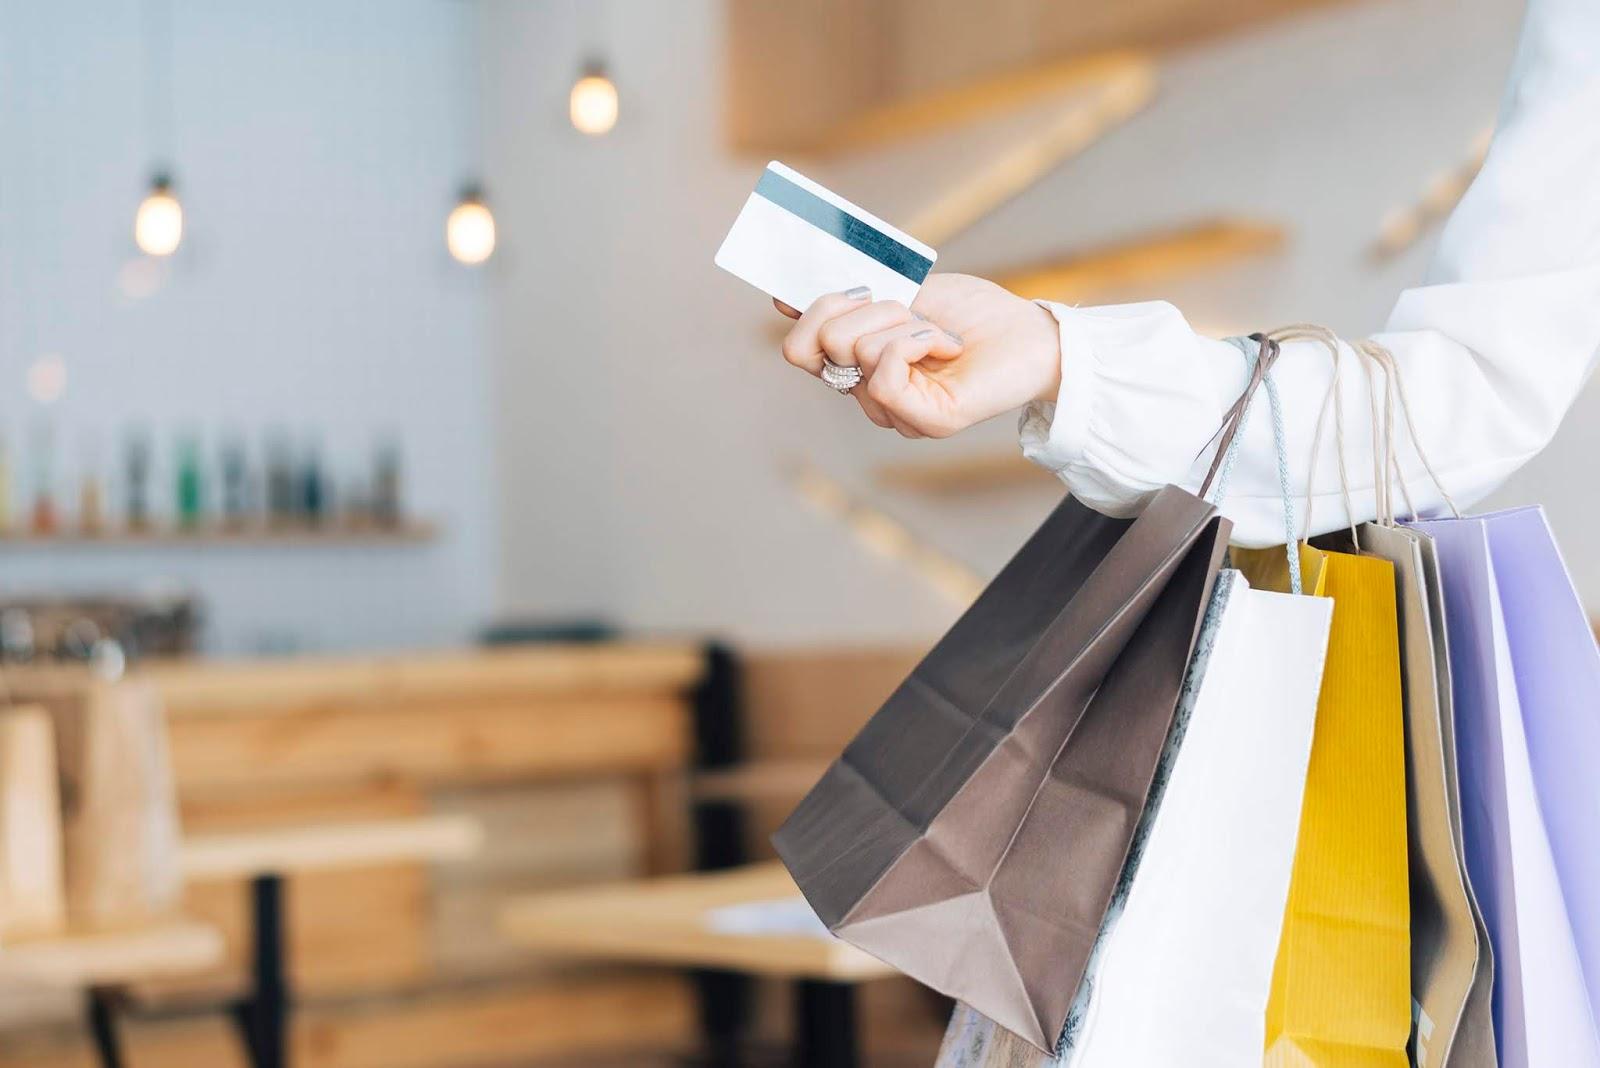 Black Friday: Psicóloga dá dicas para controlar as compras impulsivas